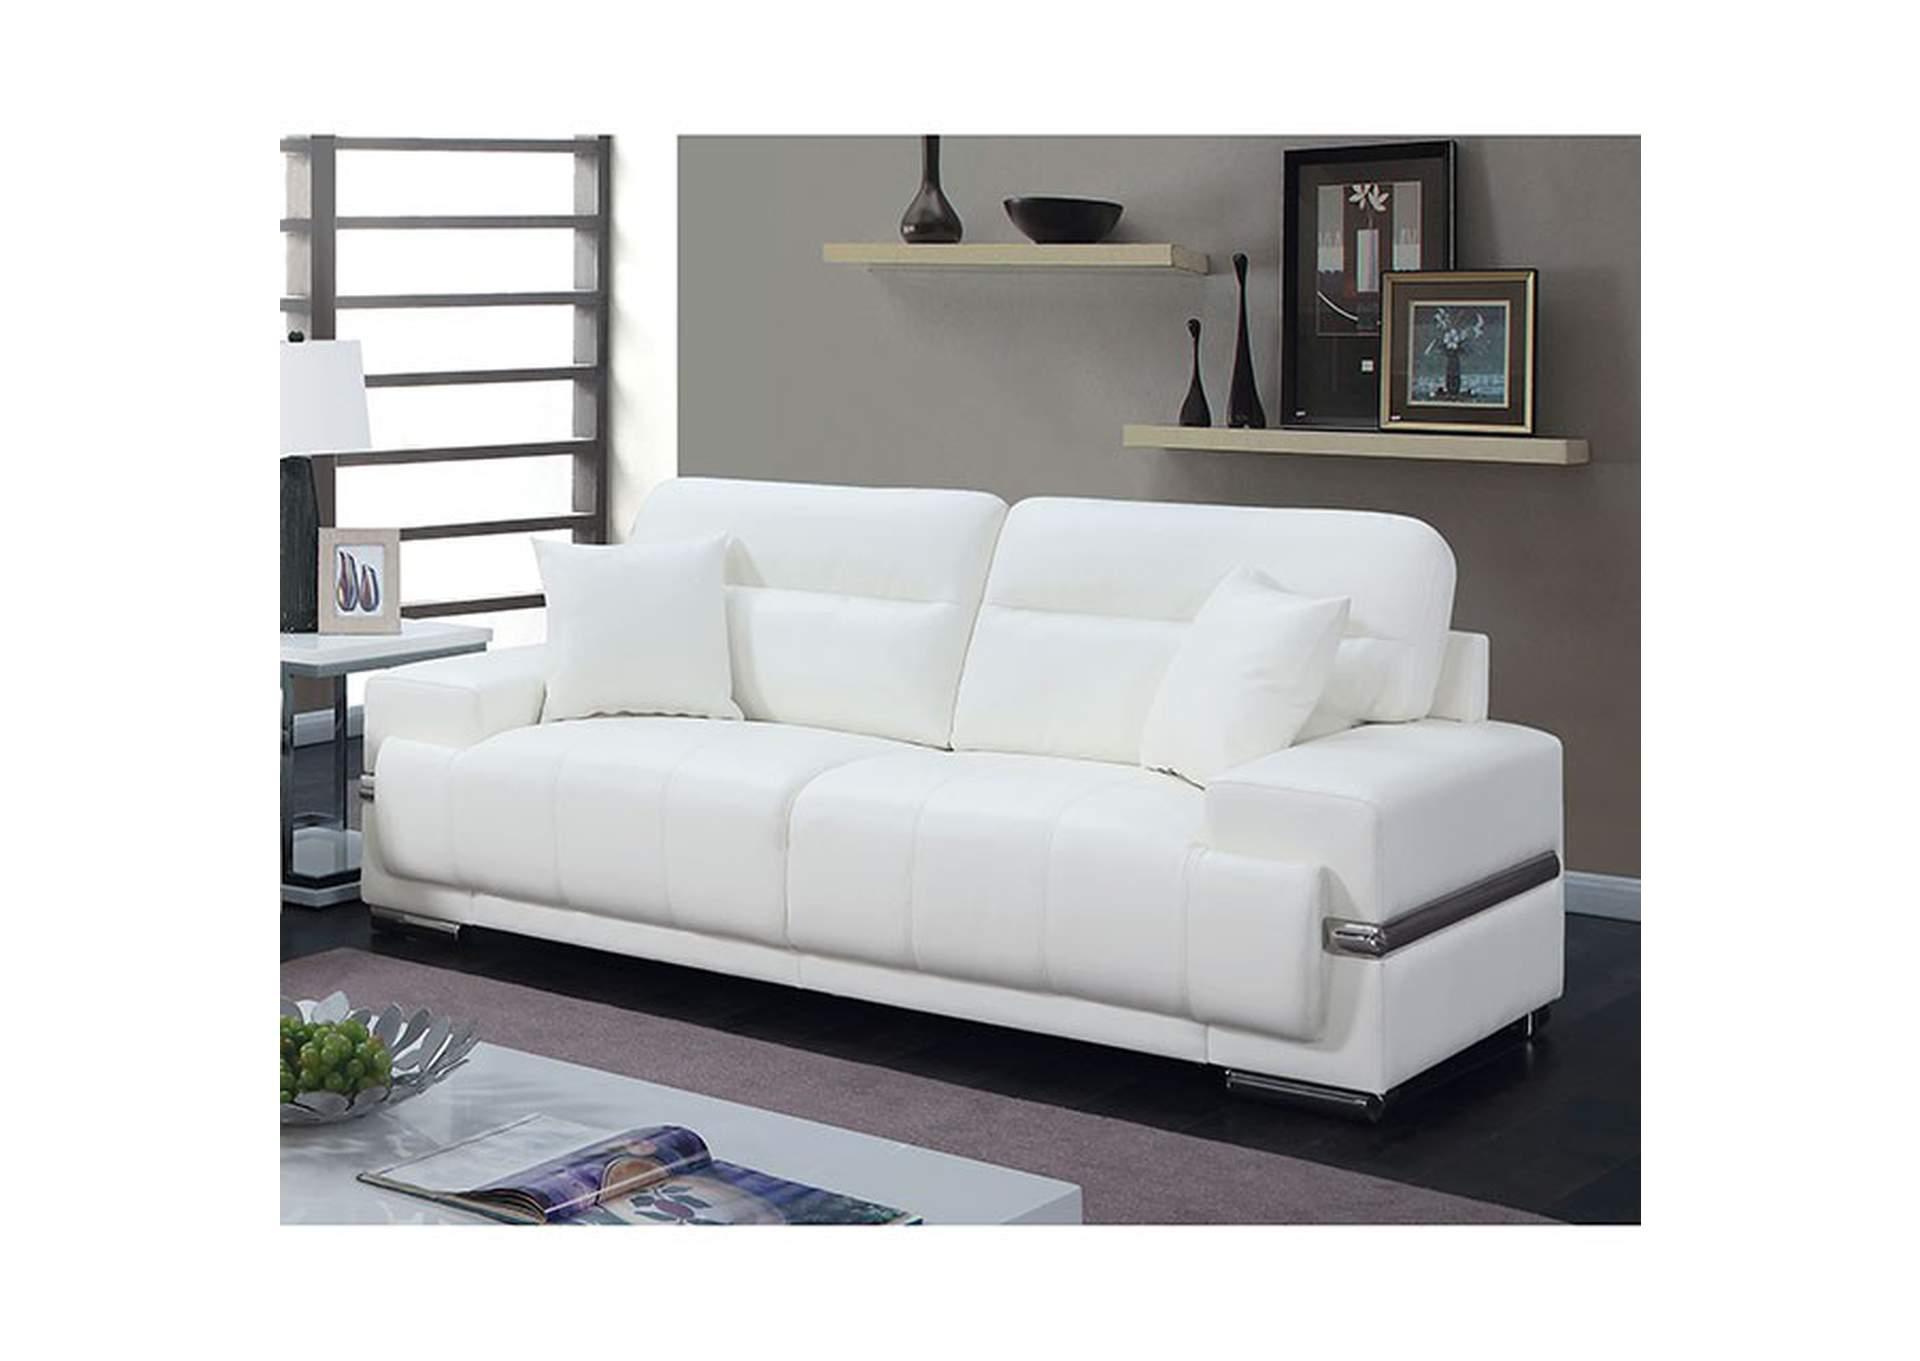 Sleep Boutique Mattress Furniture Zibak White Sofa